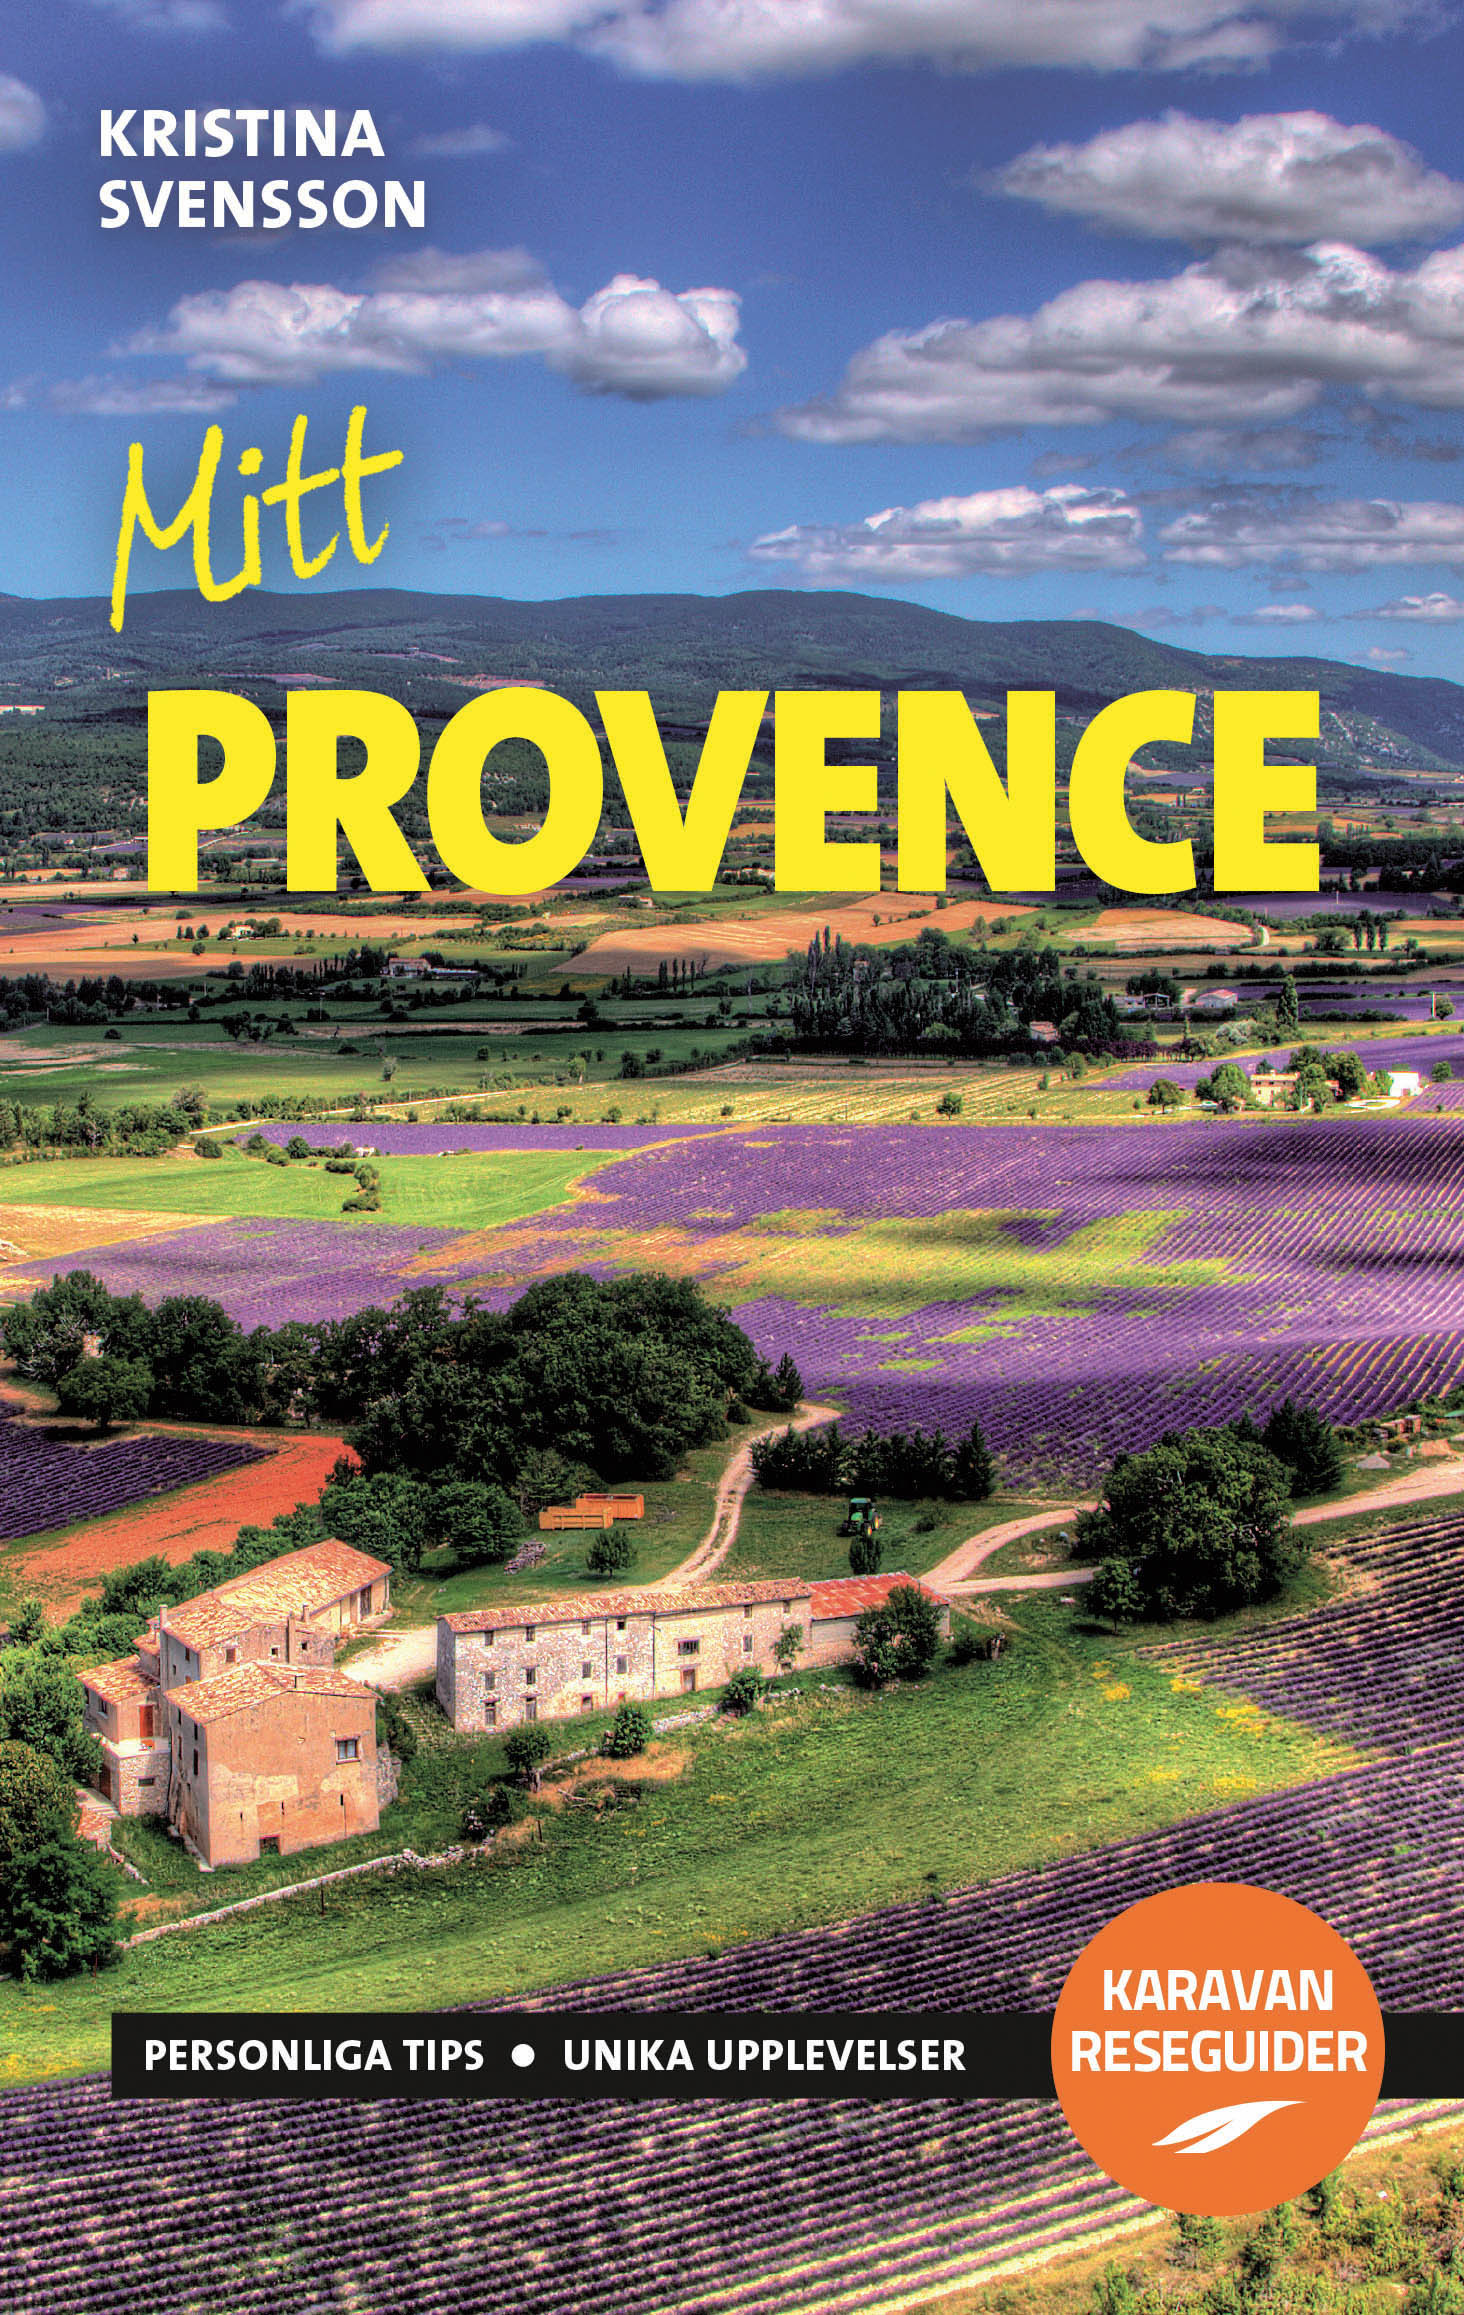 Mitt Provence av Kristina Svensson